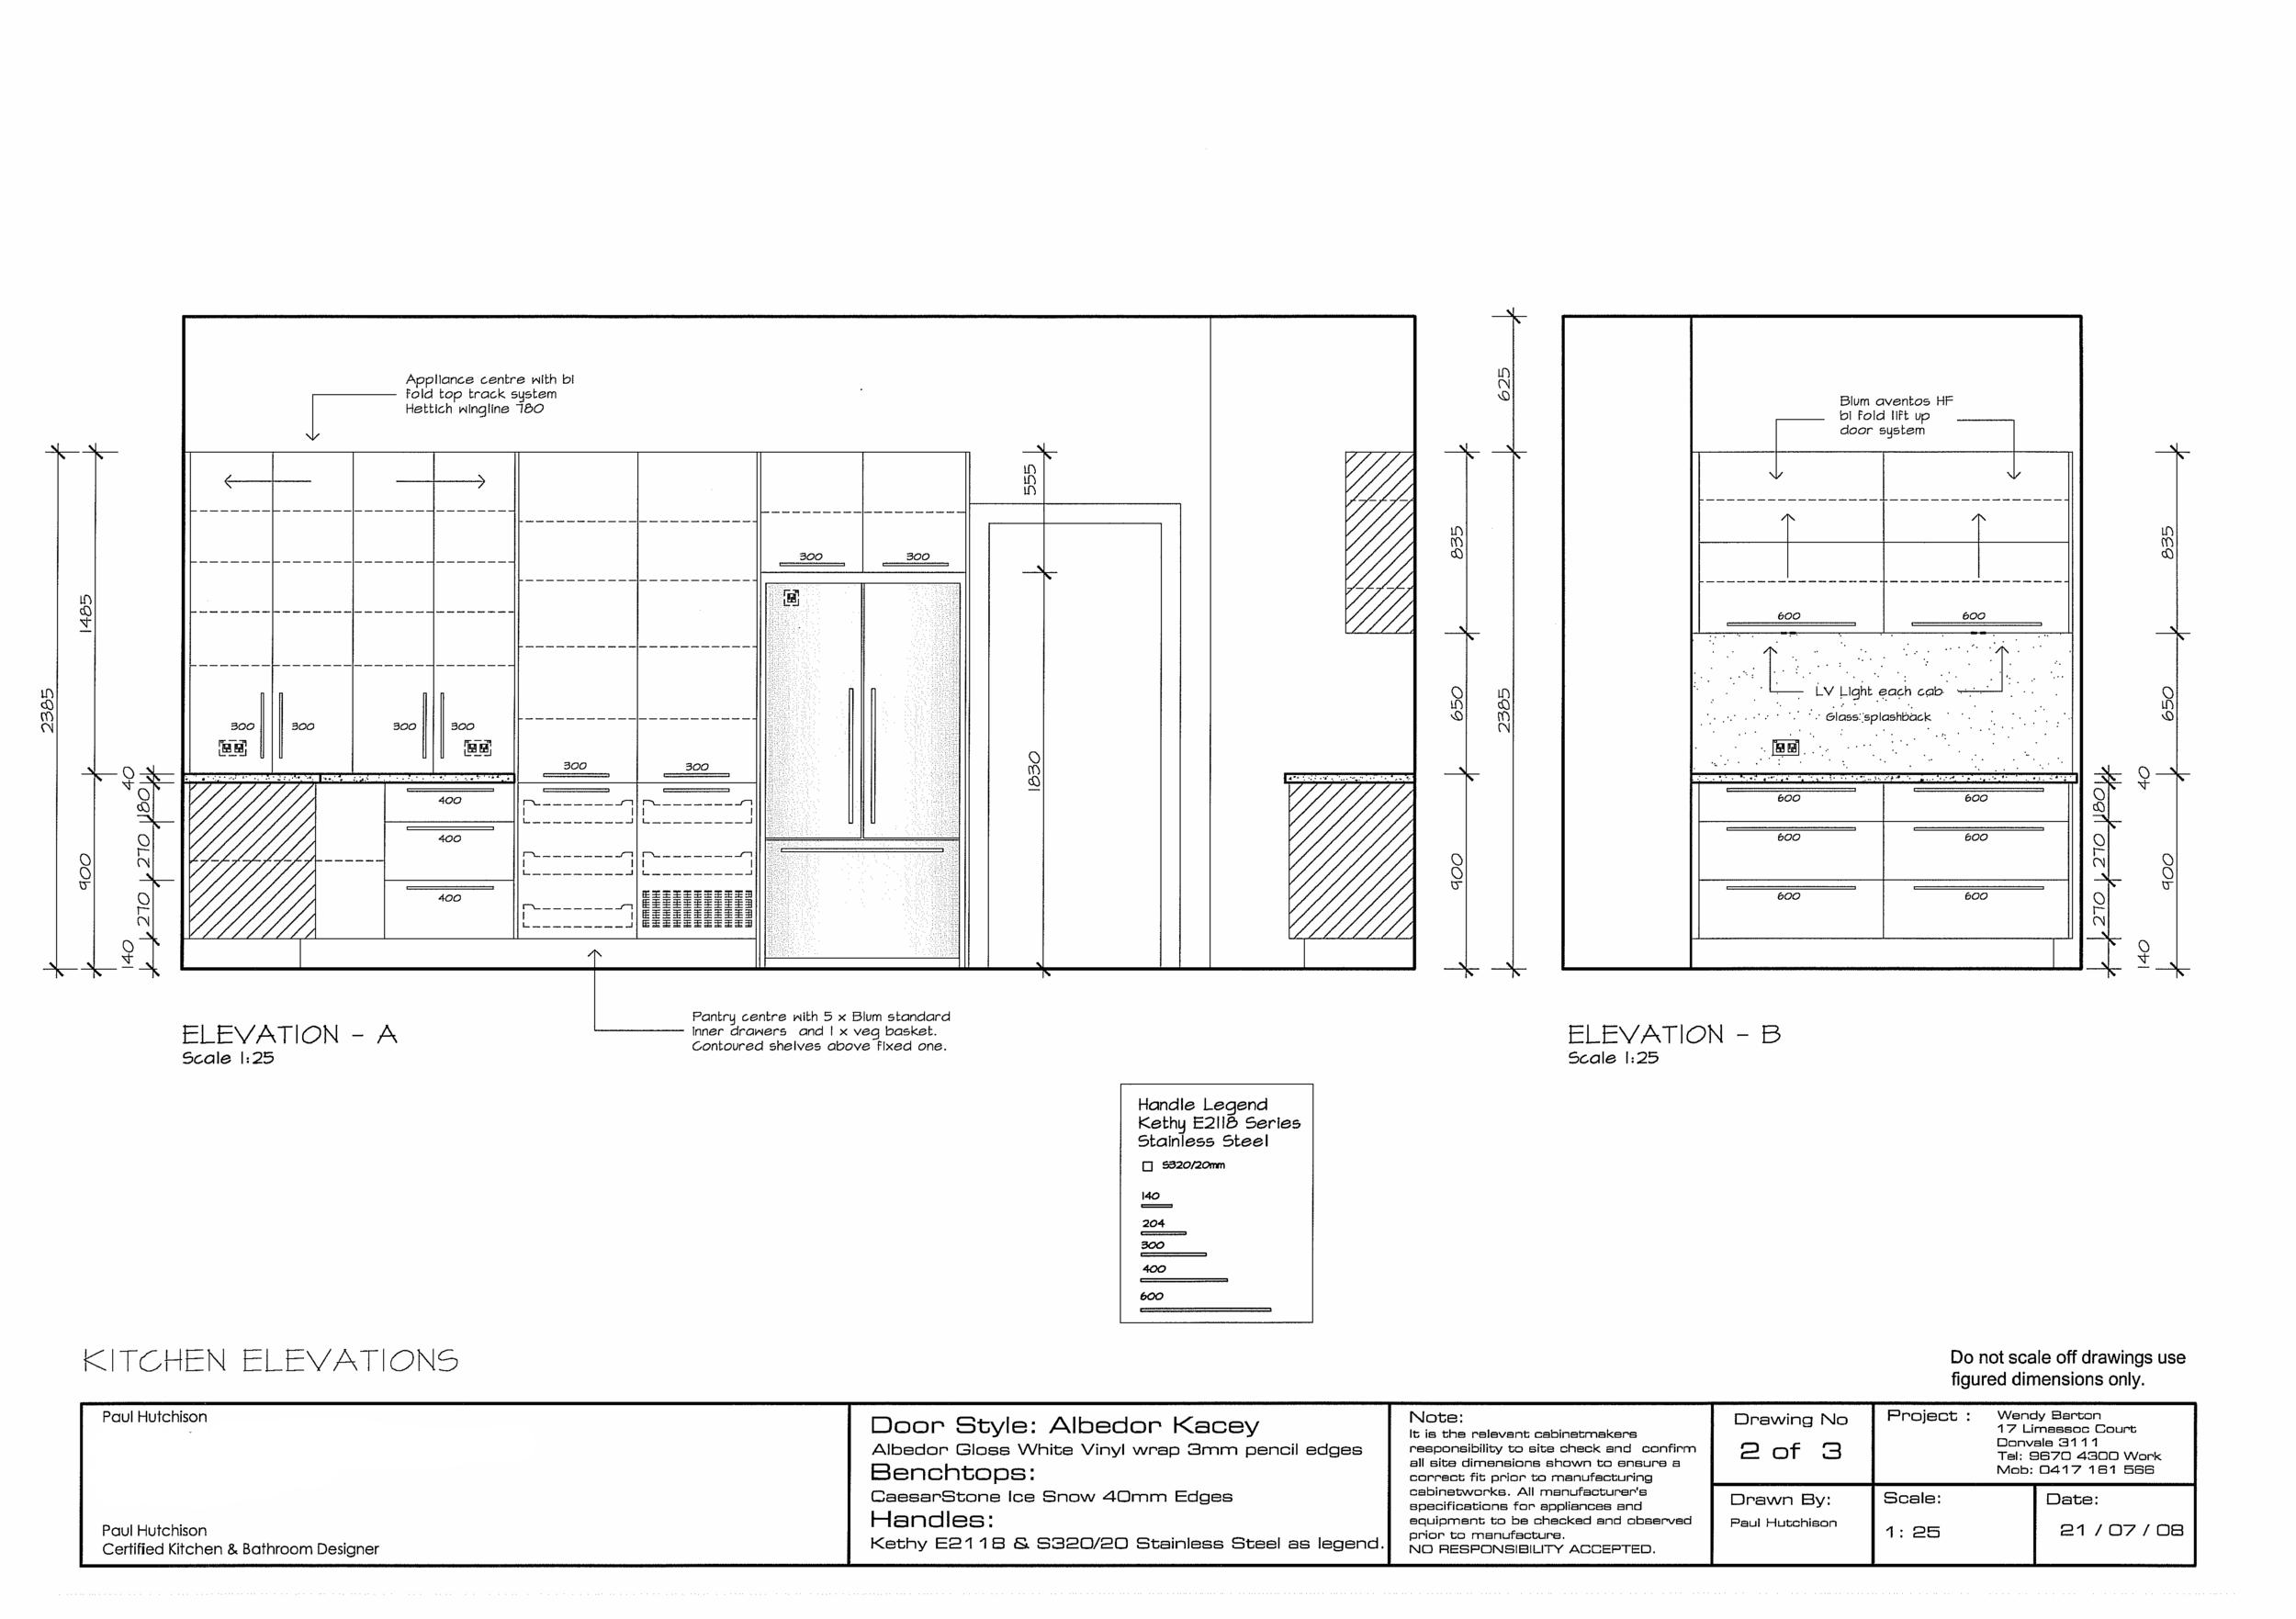 Detailed kitchen concept elevation plans